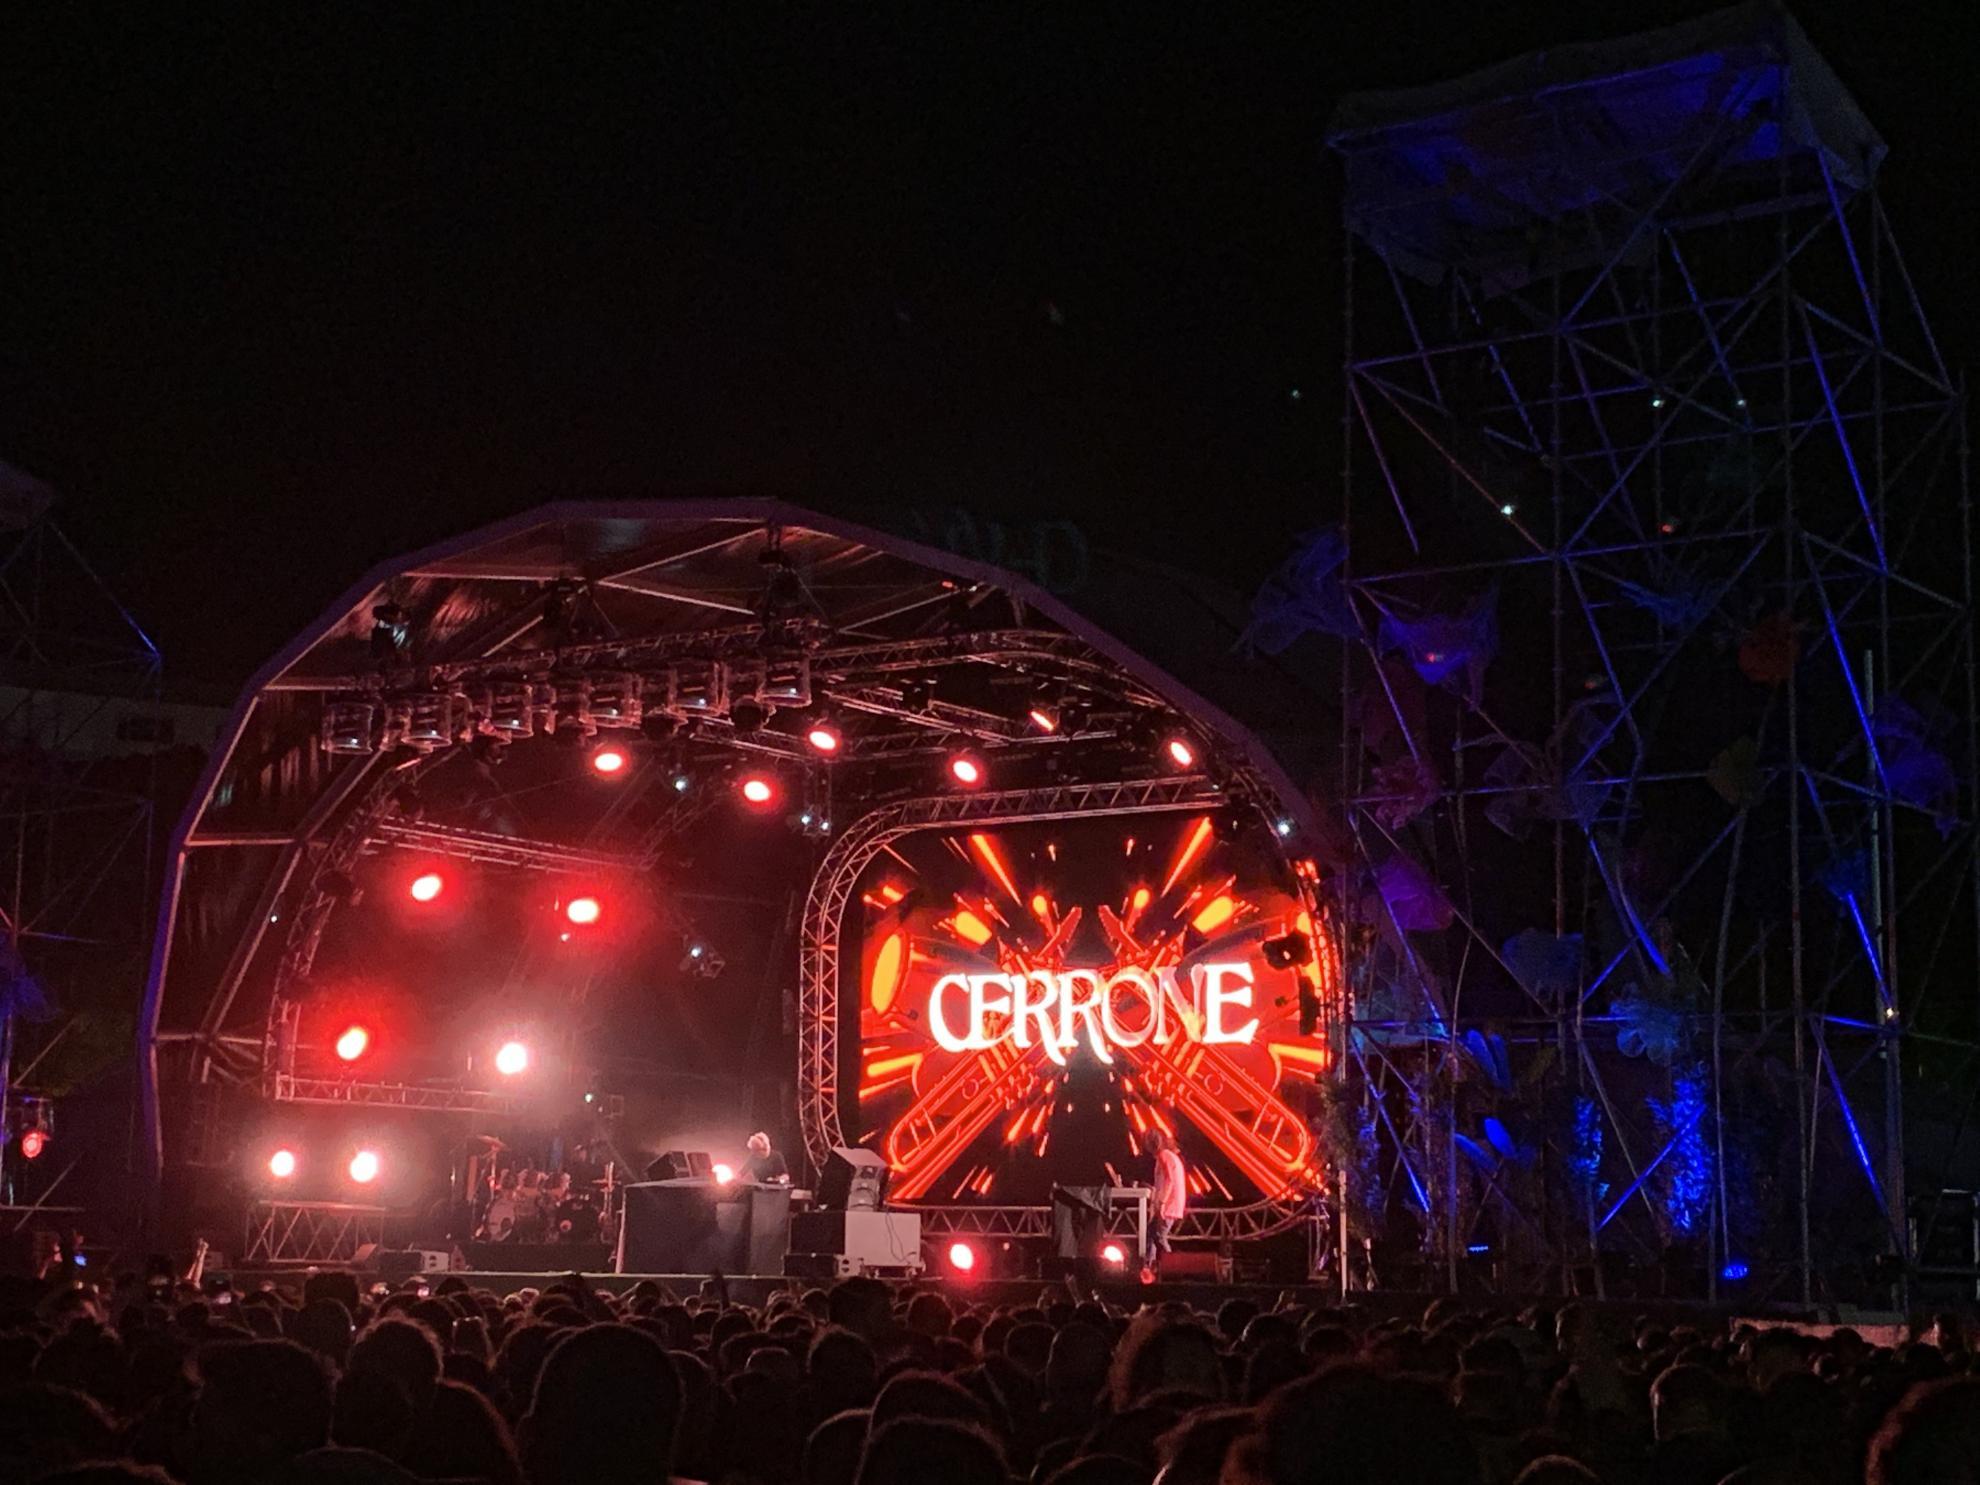 Cerrone (Paraíso festival 2019 by Fanmusicfest)